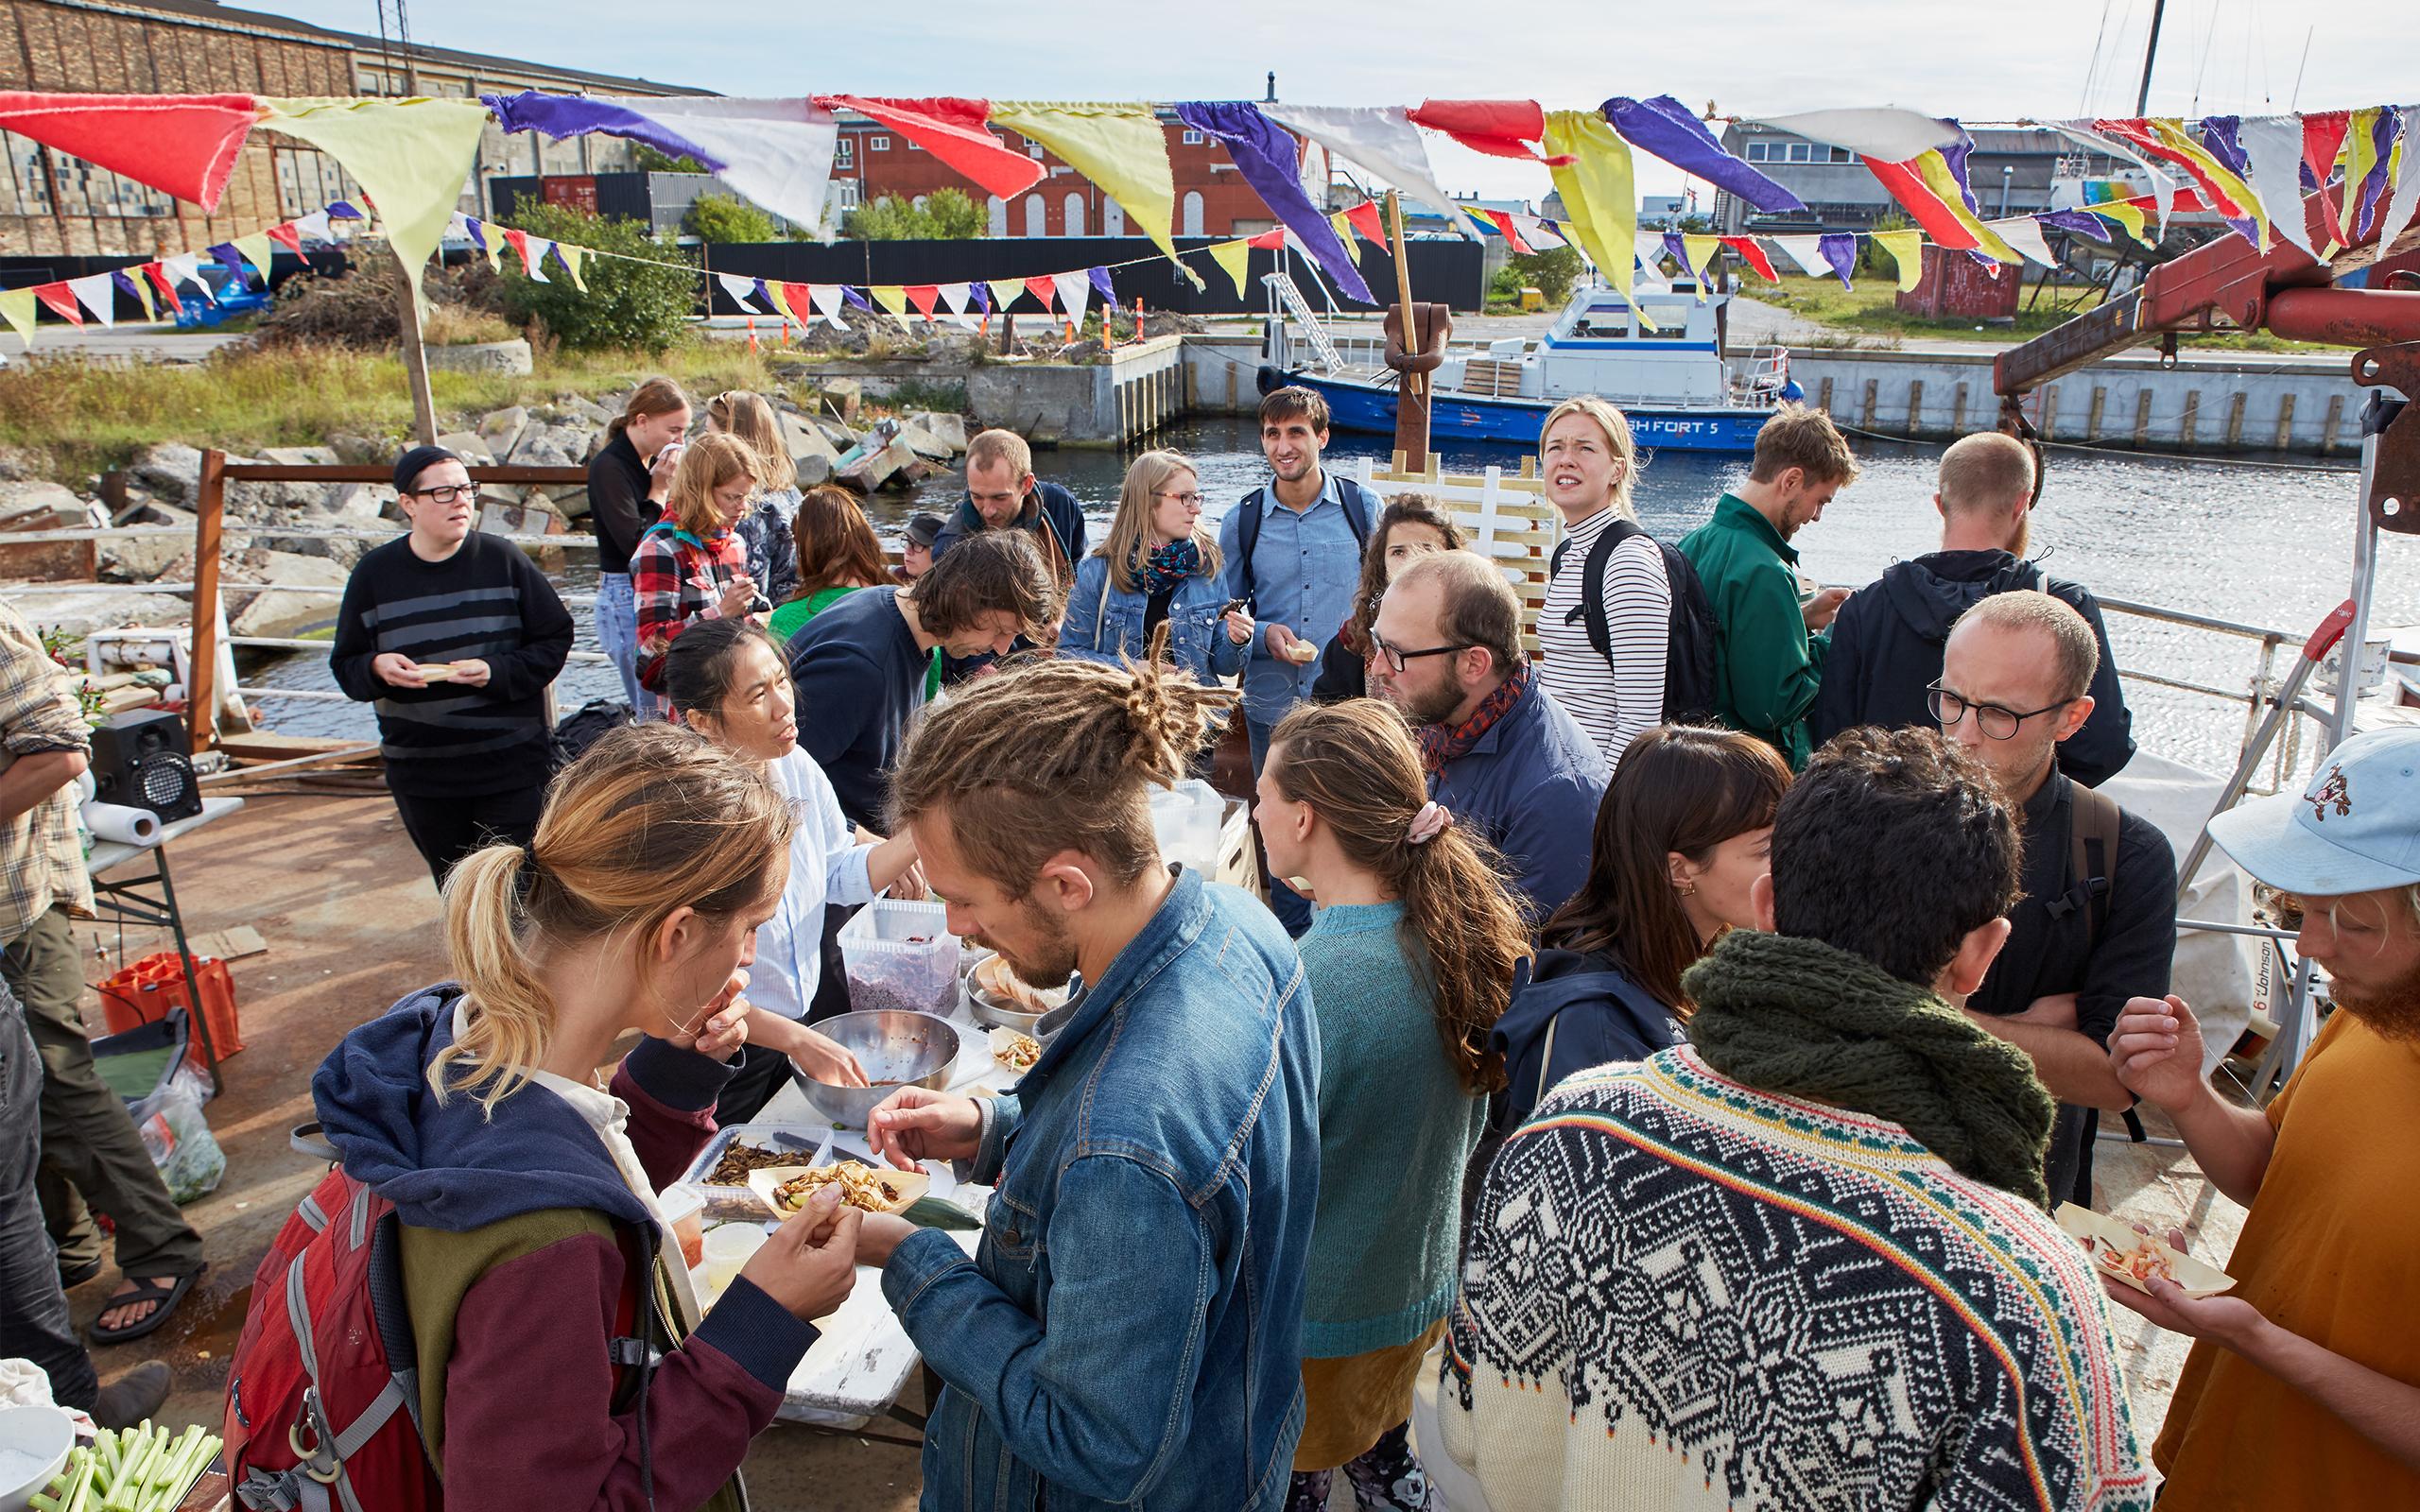 Unge mennesker spiser mad ombord på et skib